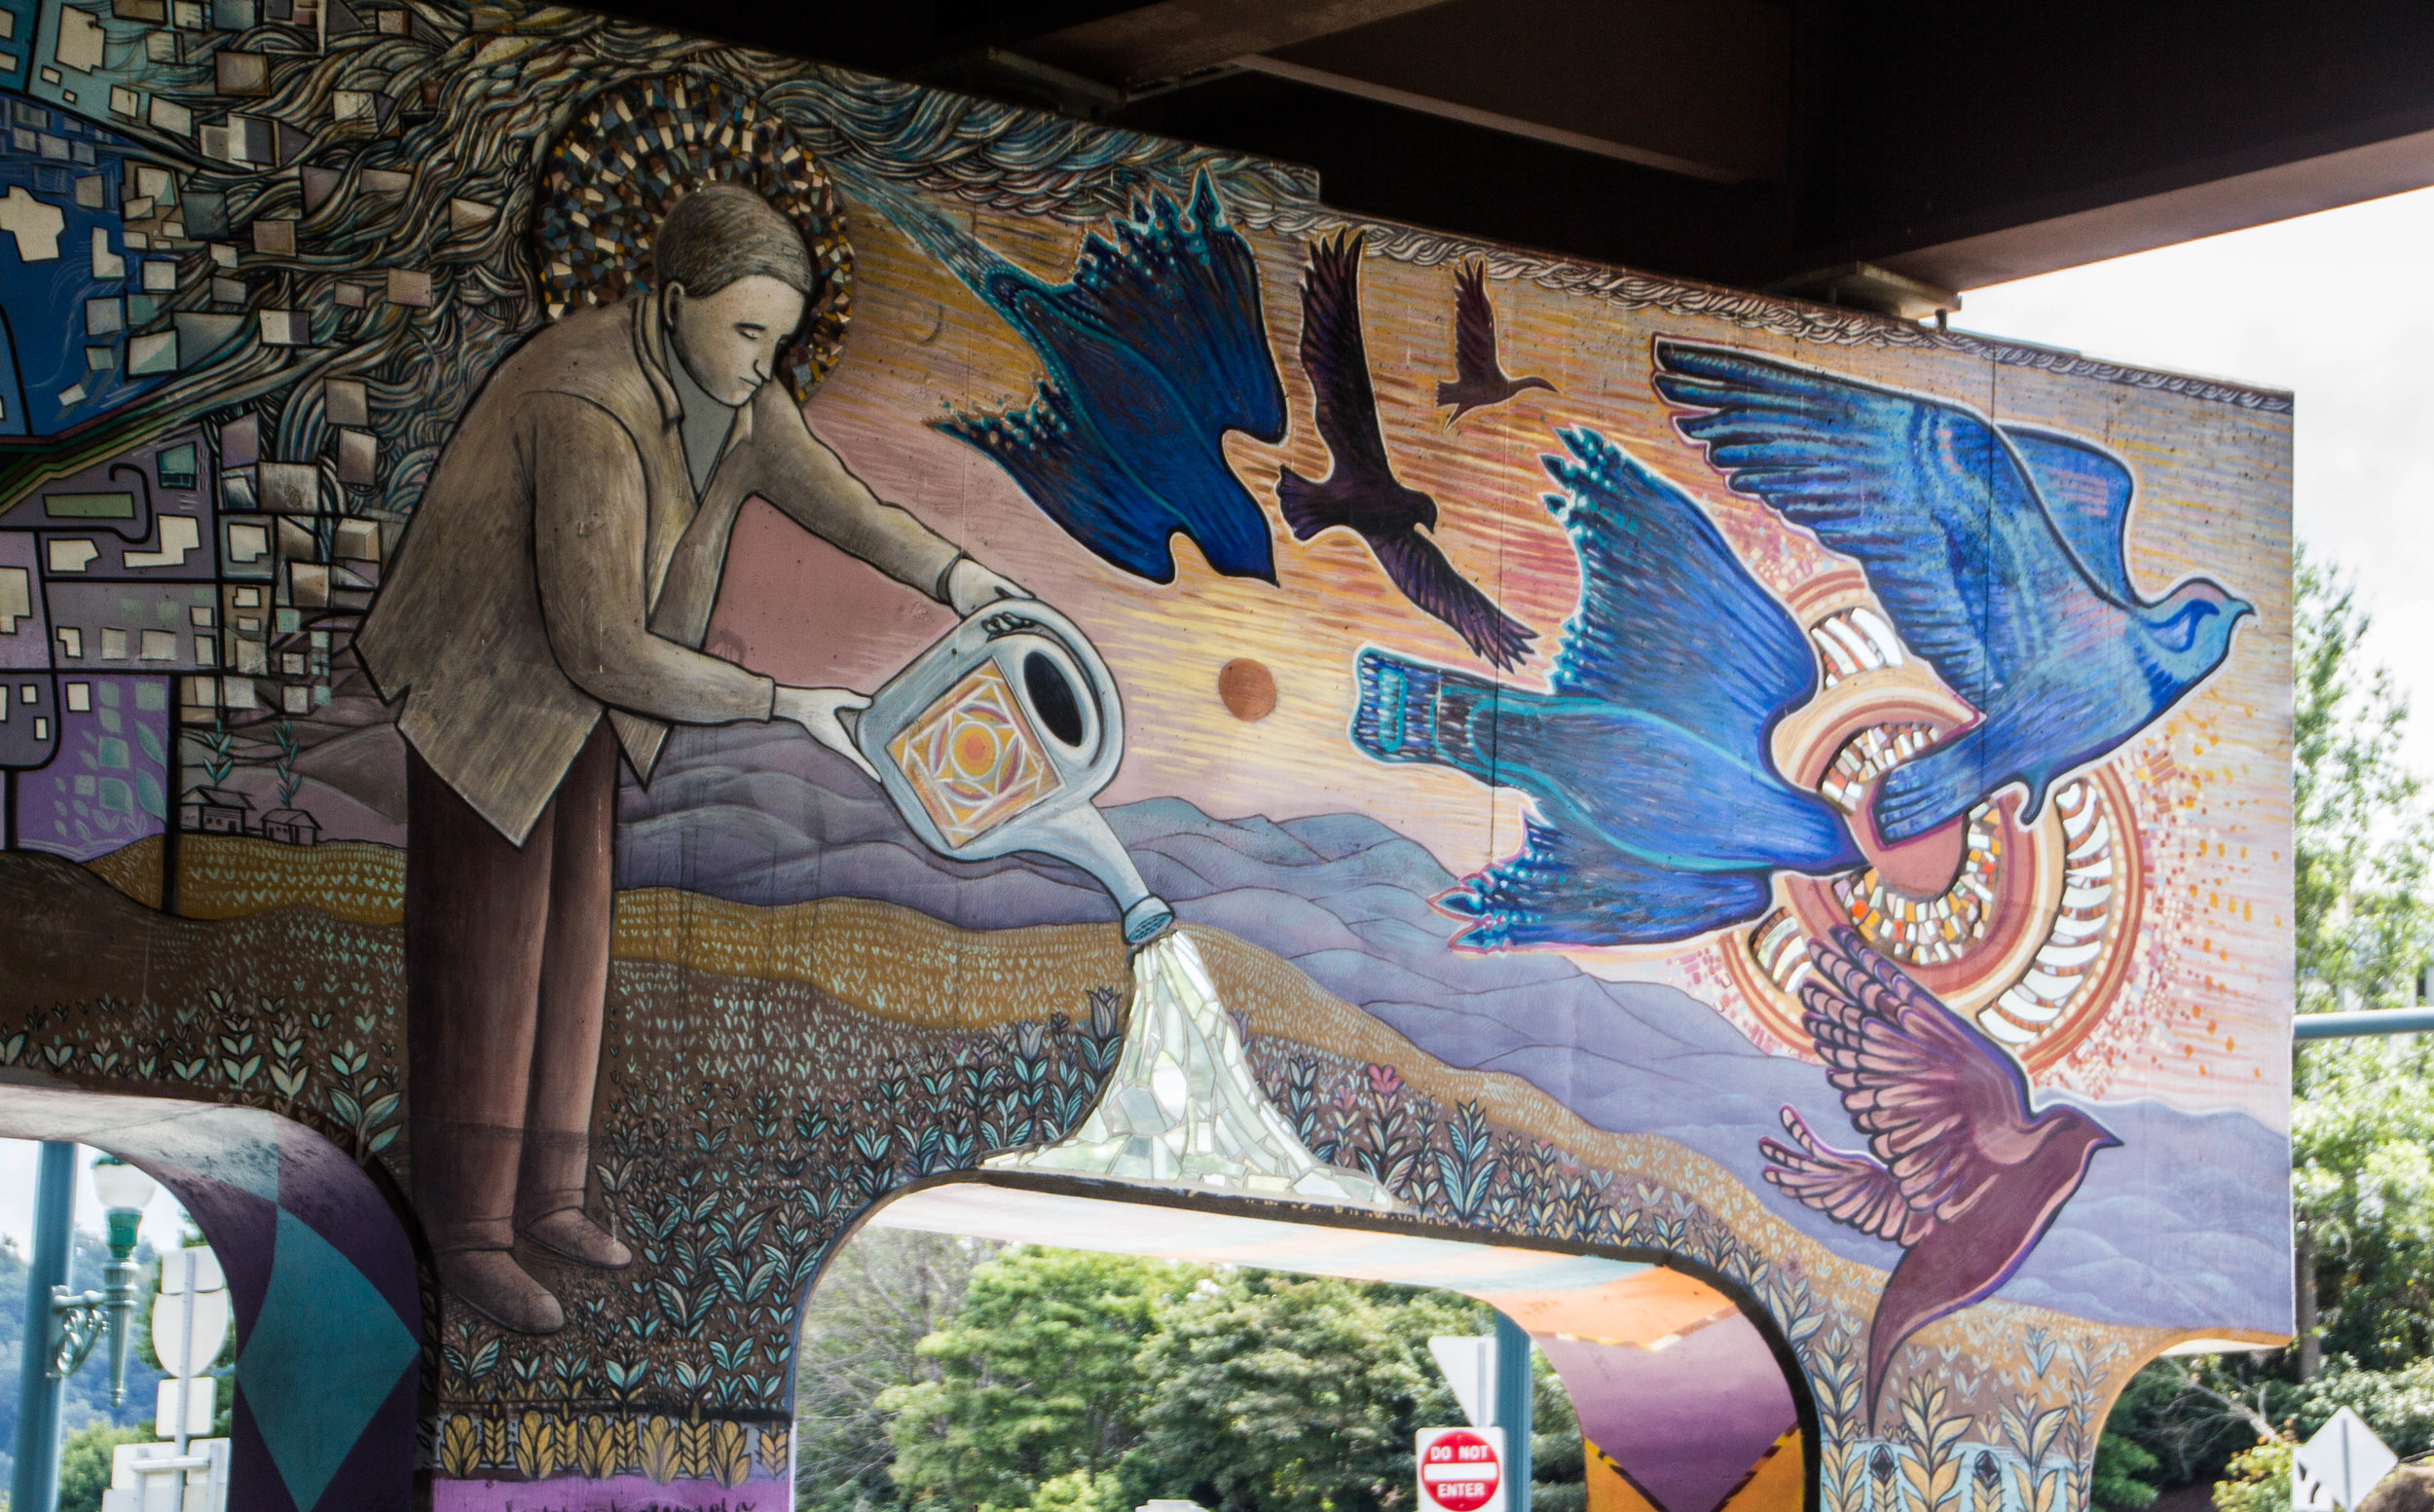 street-art-asheville-north-carolina-13.jpg